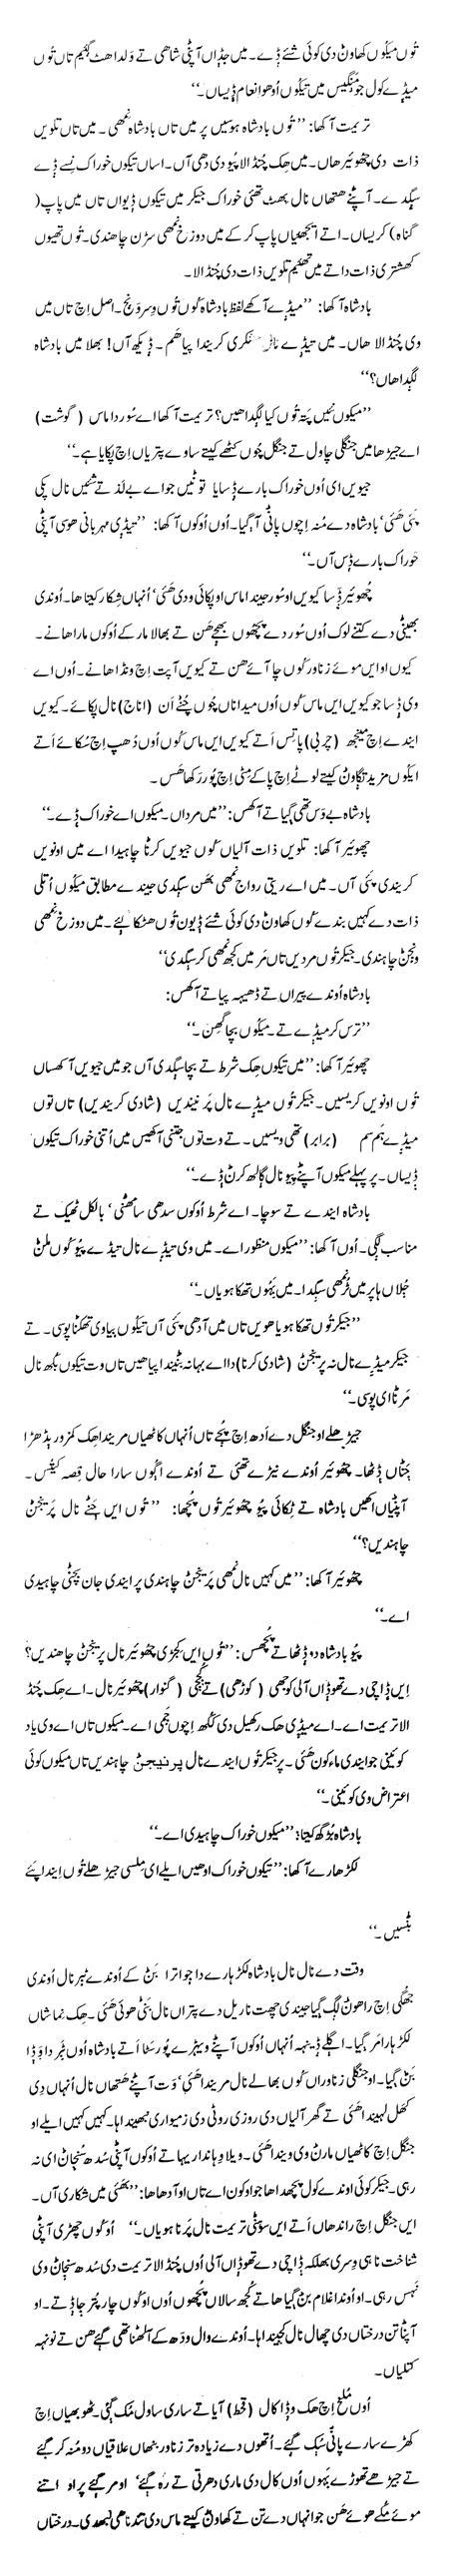 Seraiki Afsana Lawanra (R.K.Narian translator Azhar Lashari) Part-3